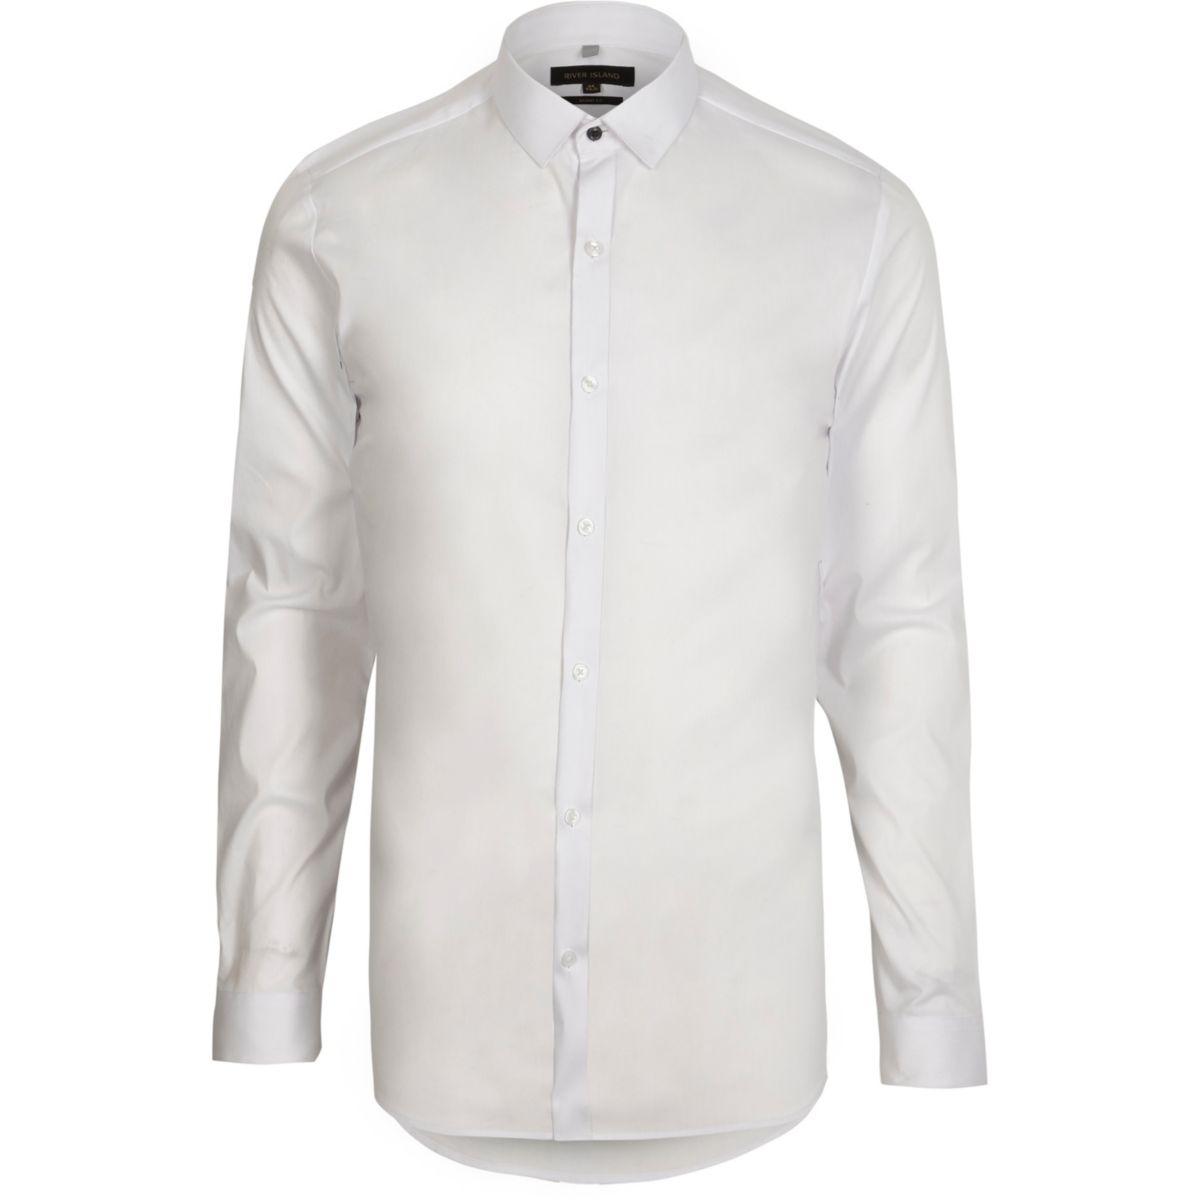 White long sleeve skinny fit smart shirt